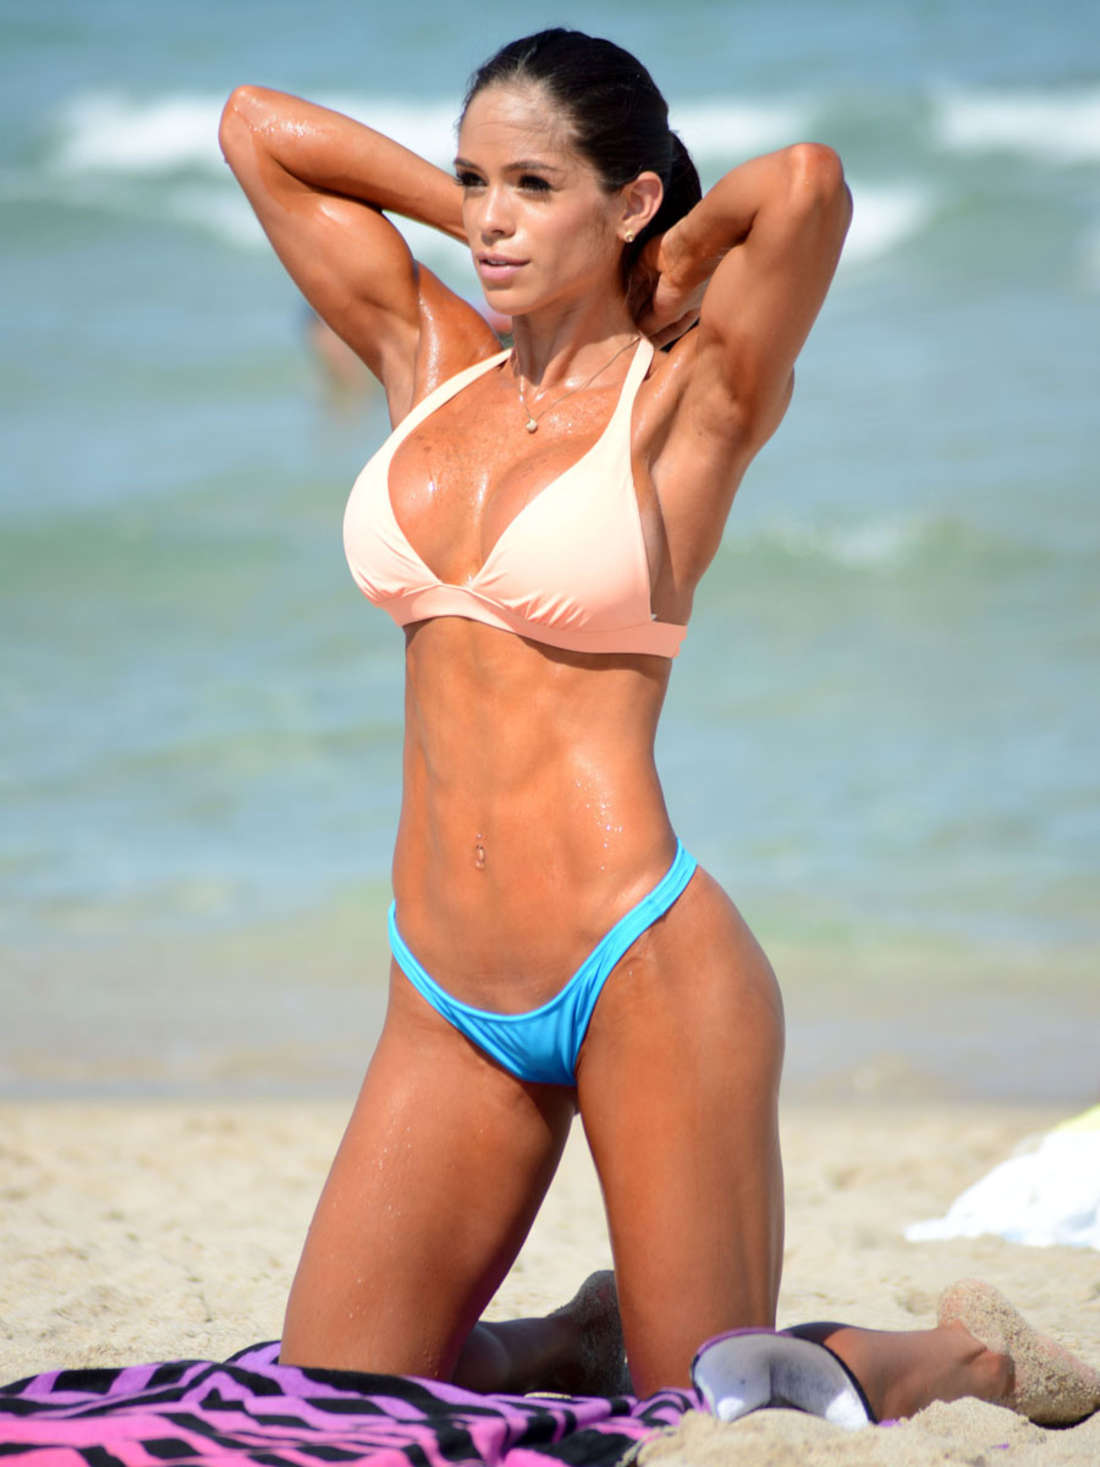 Michelle-Lewin-Hot-in-Bikini--13.jpg